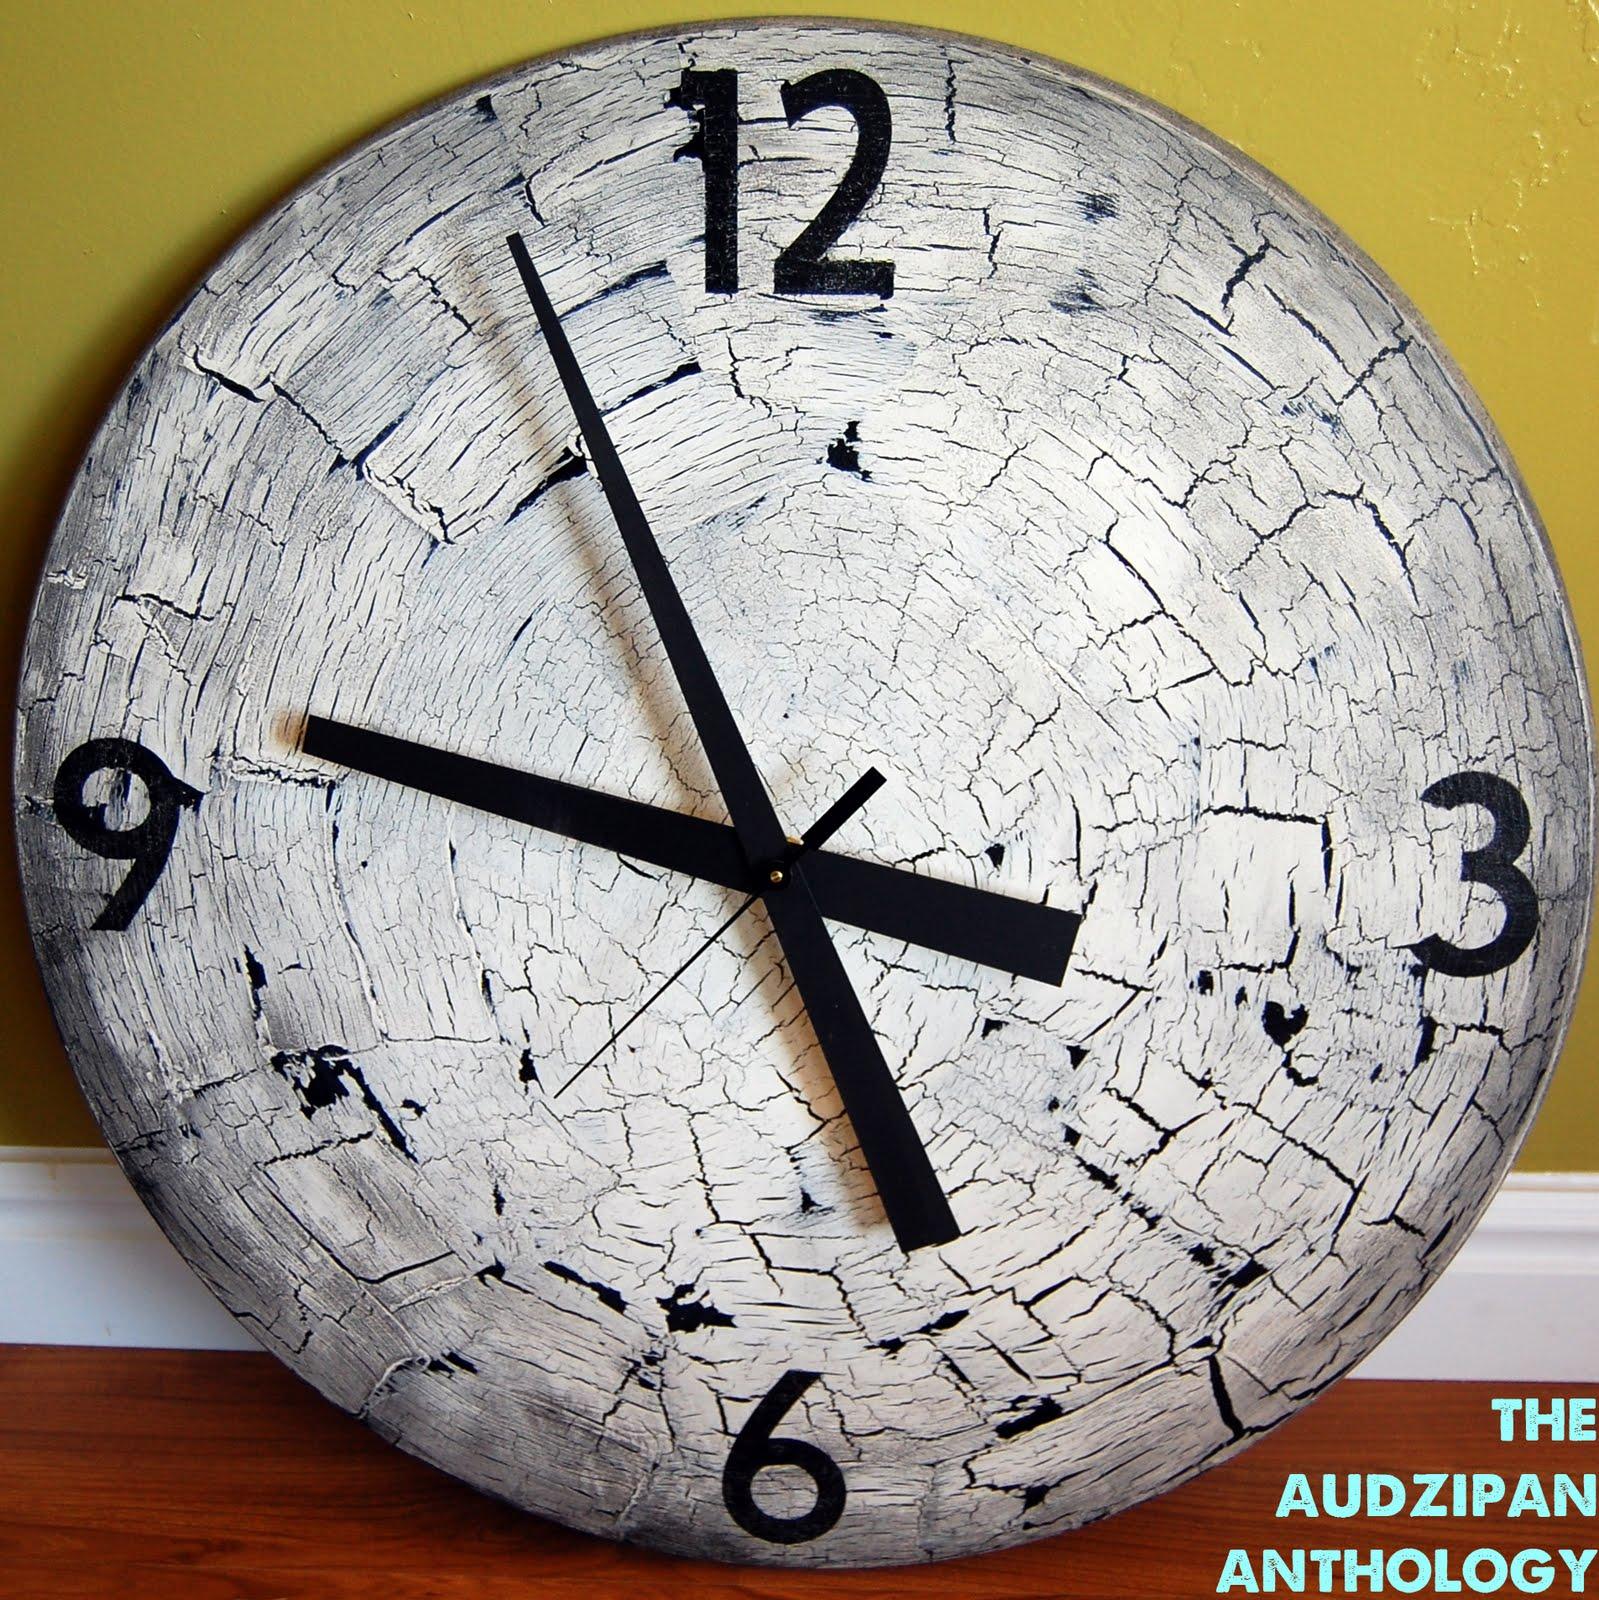 The Audzipan Anthology Diy Big Wall Clock